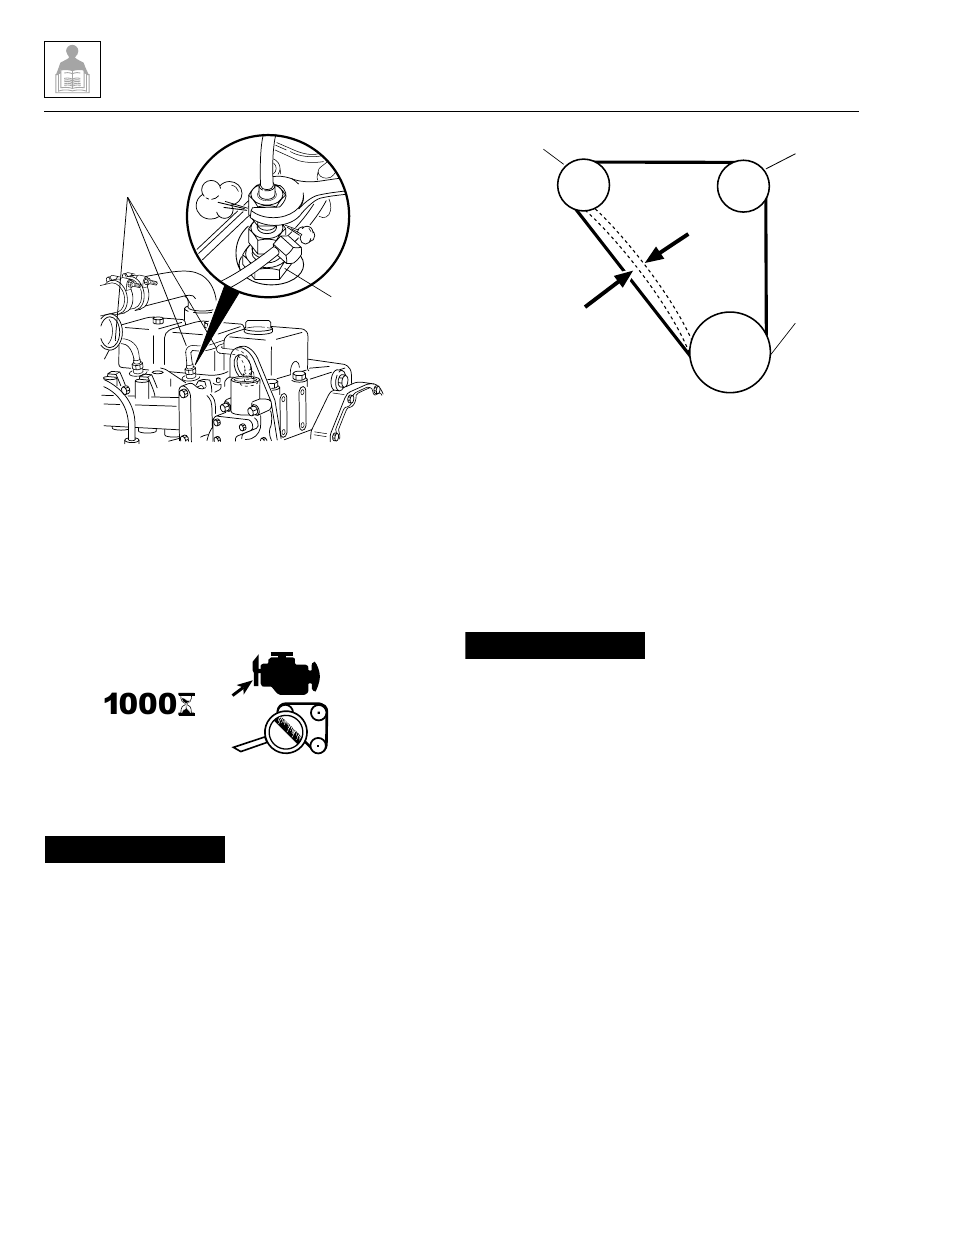 Engine Fan Belt 28 Lt See 2128 Skytrak 3606 Service Manual Diagram